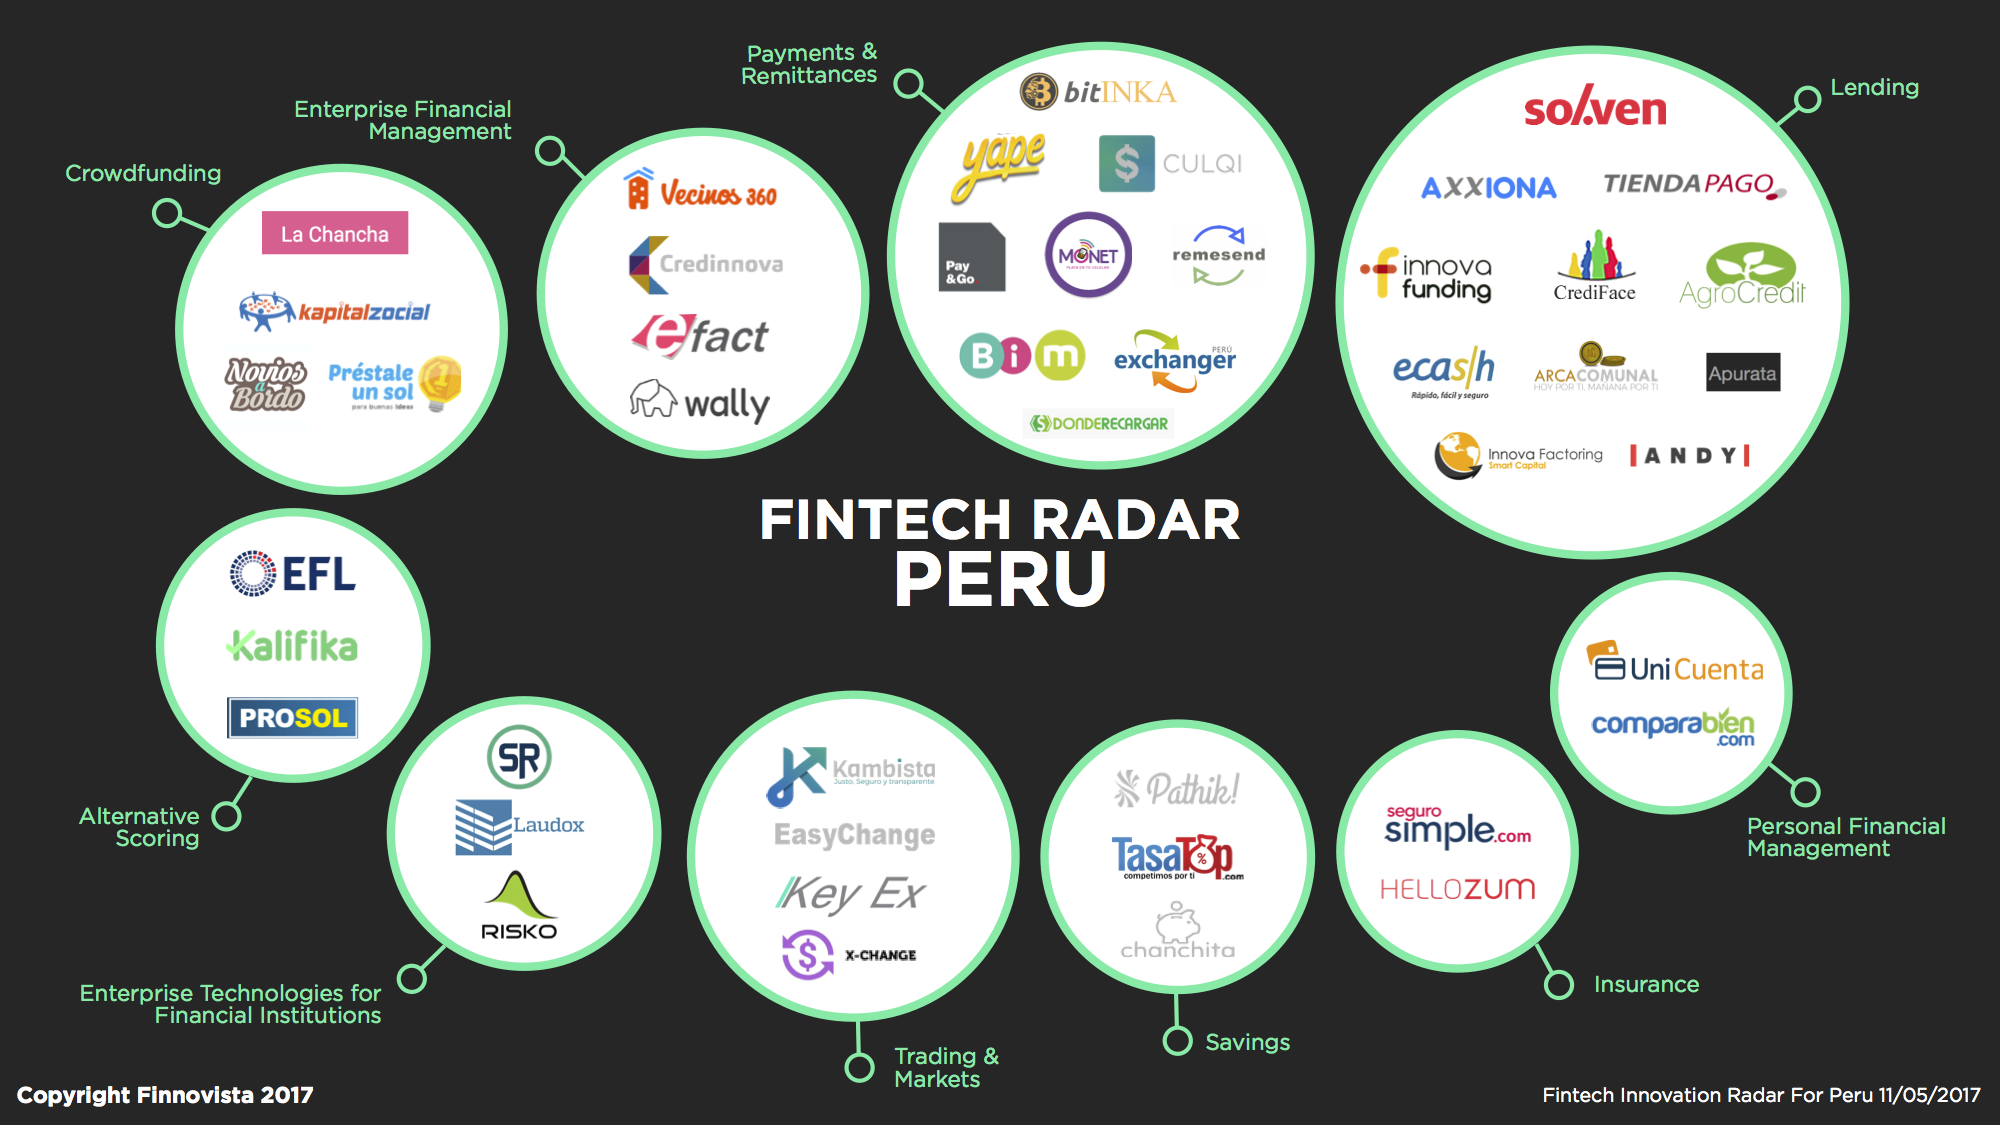 Fintech Radar Perú